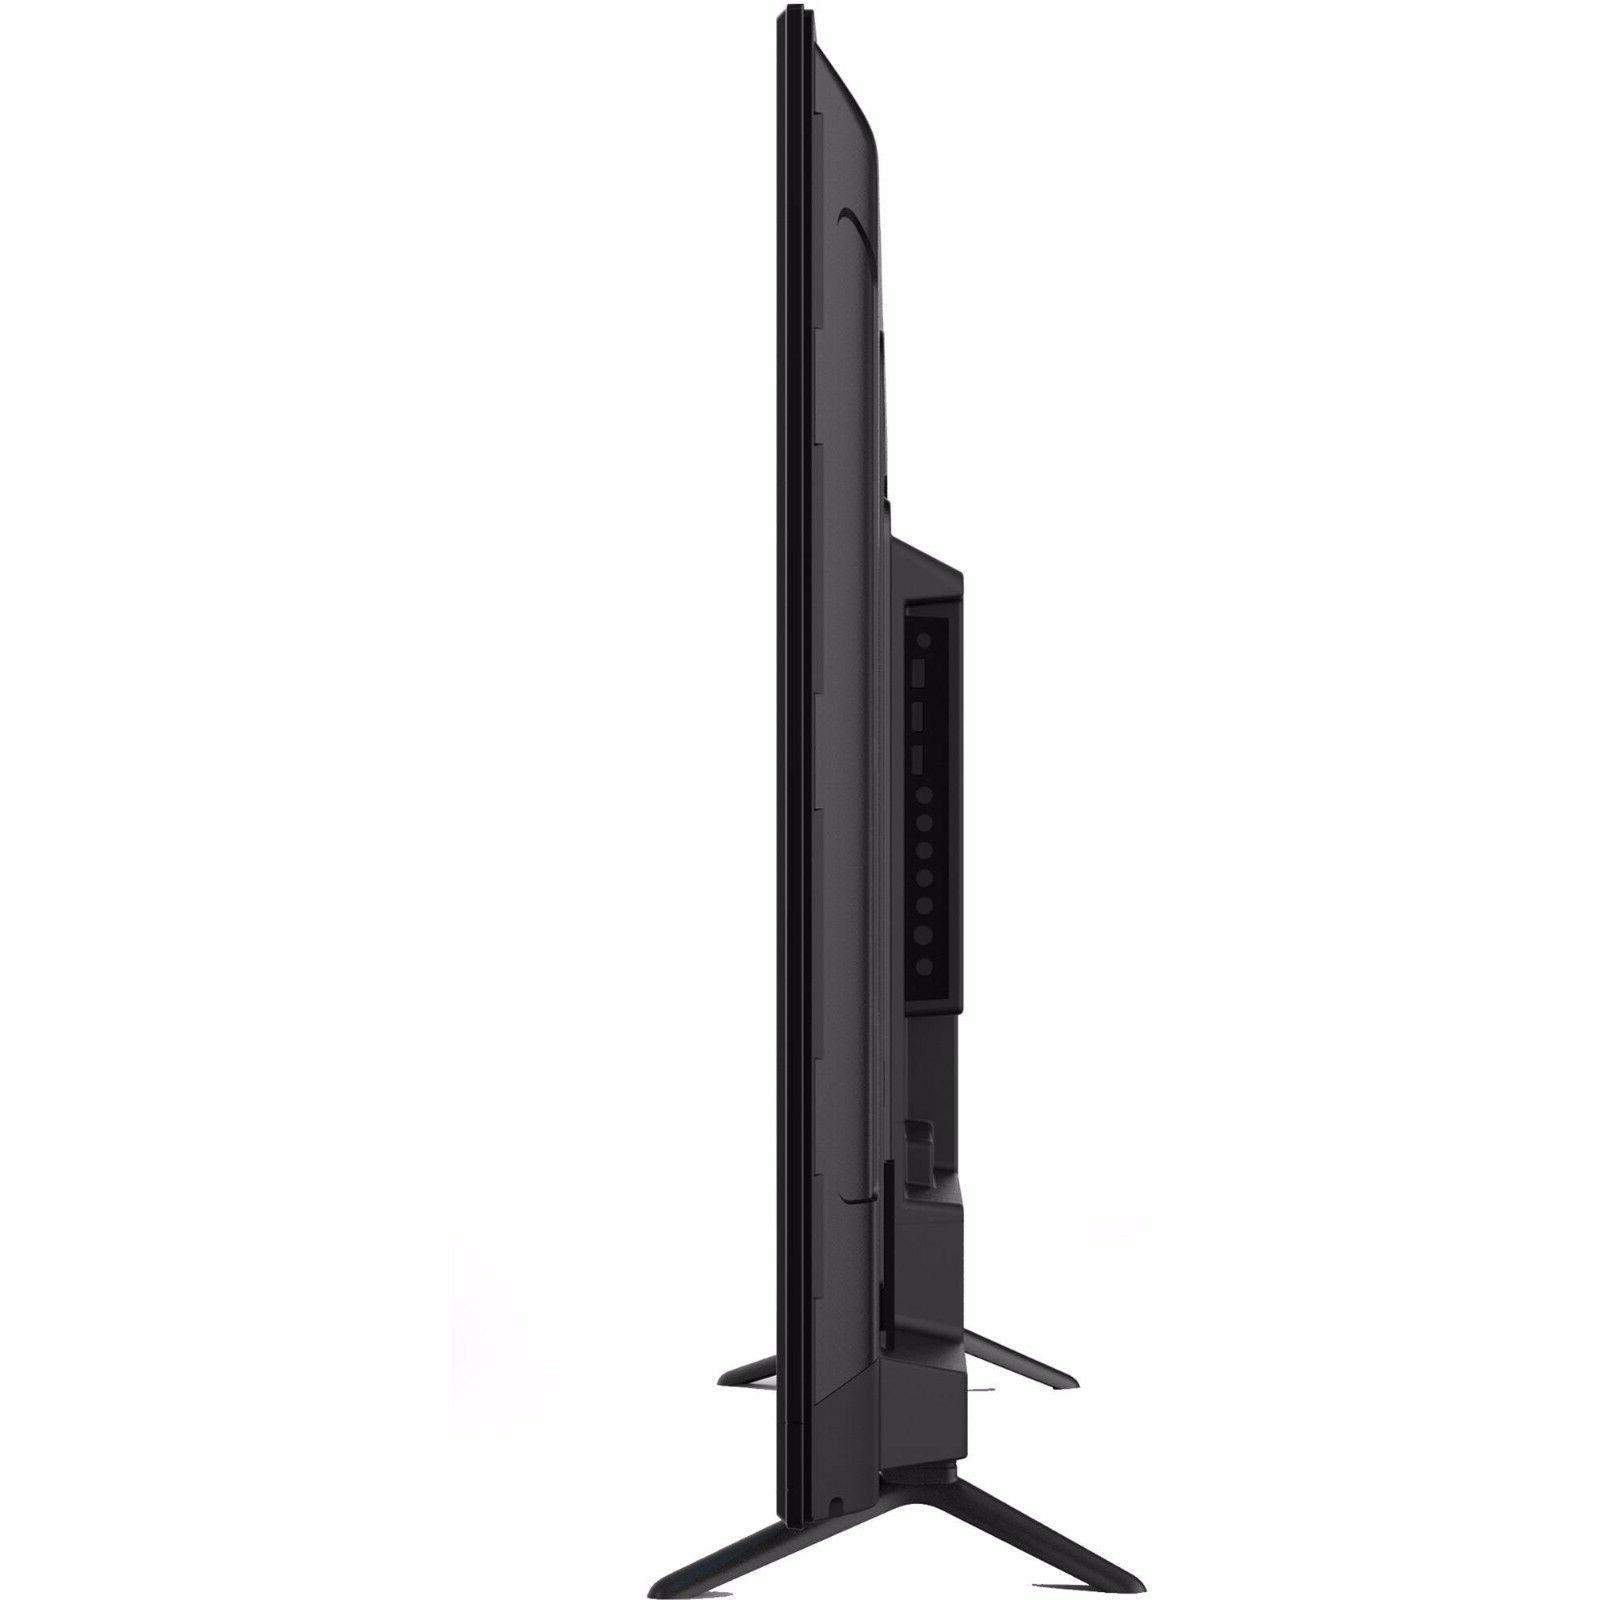 "Proscan 50"" inch 1080p FULL HD LCD TV w/ 3 HDMI -"